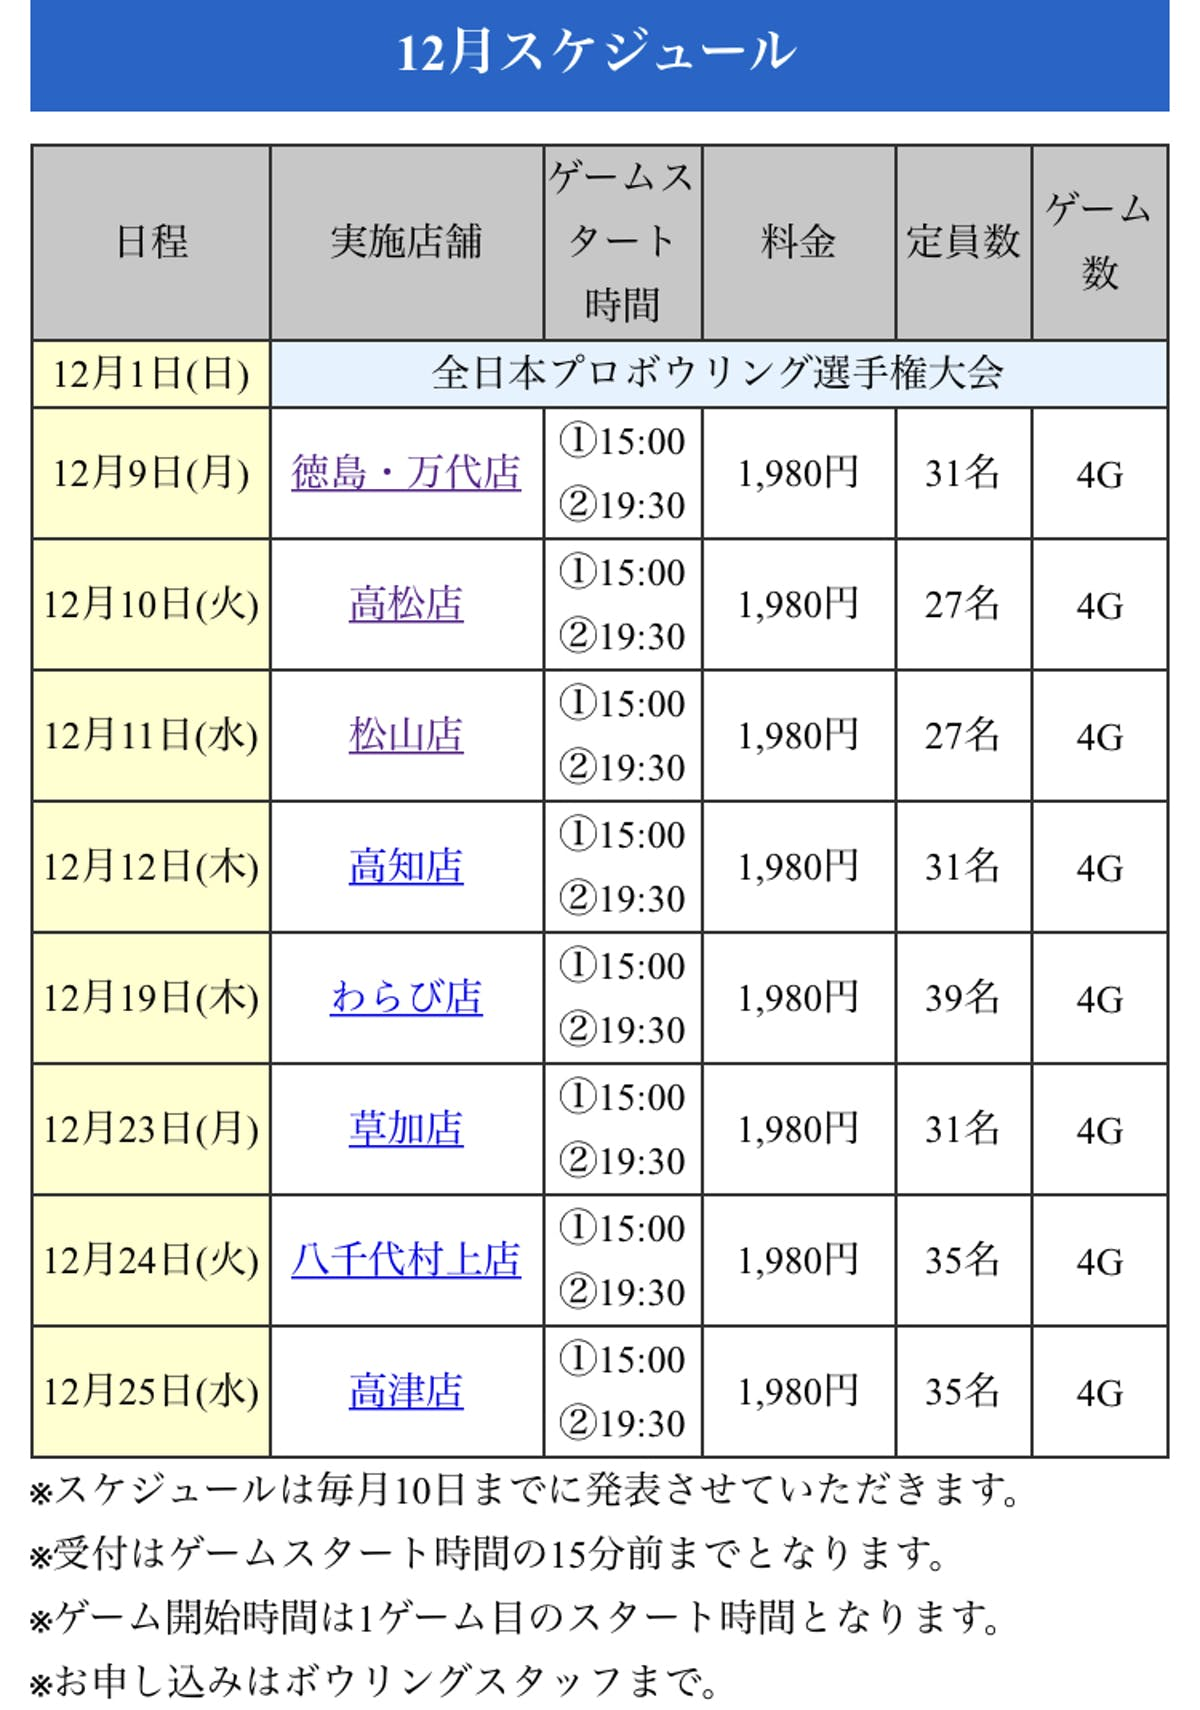 463AB8EF-FB9D-436E-885C-F3E06F78A993.jpeg